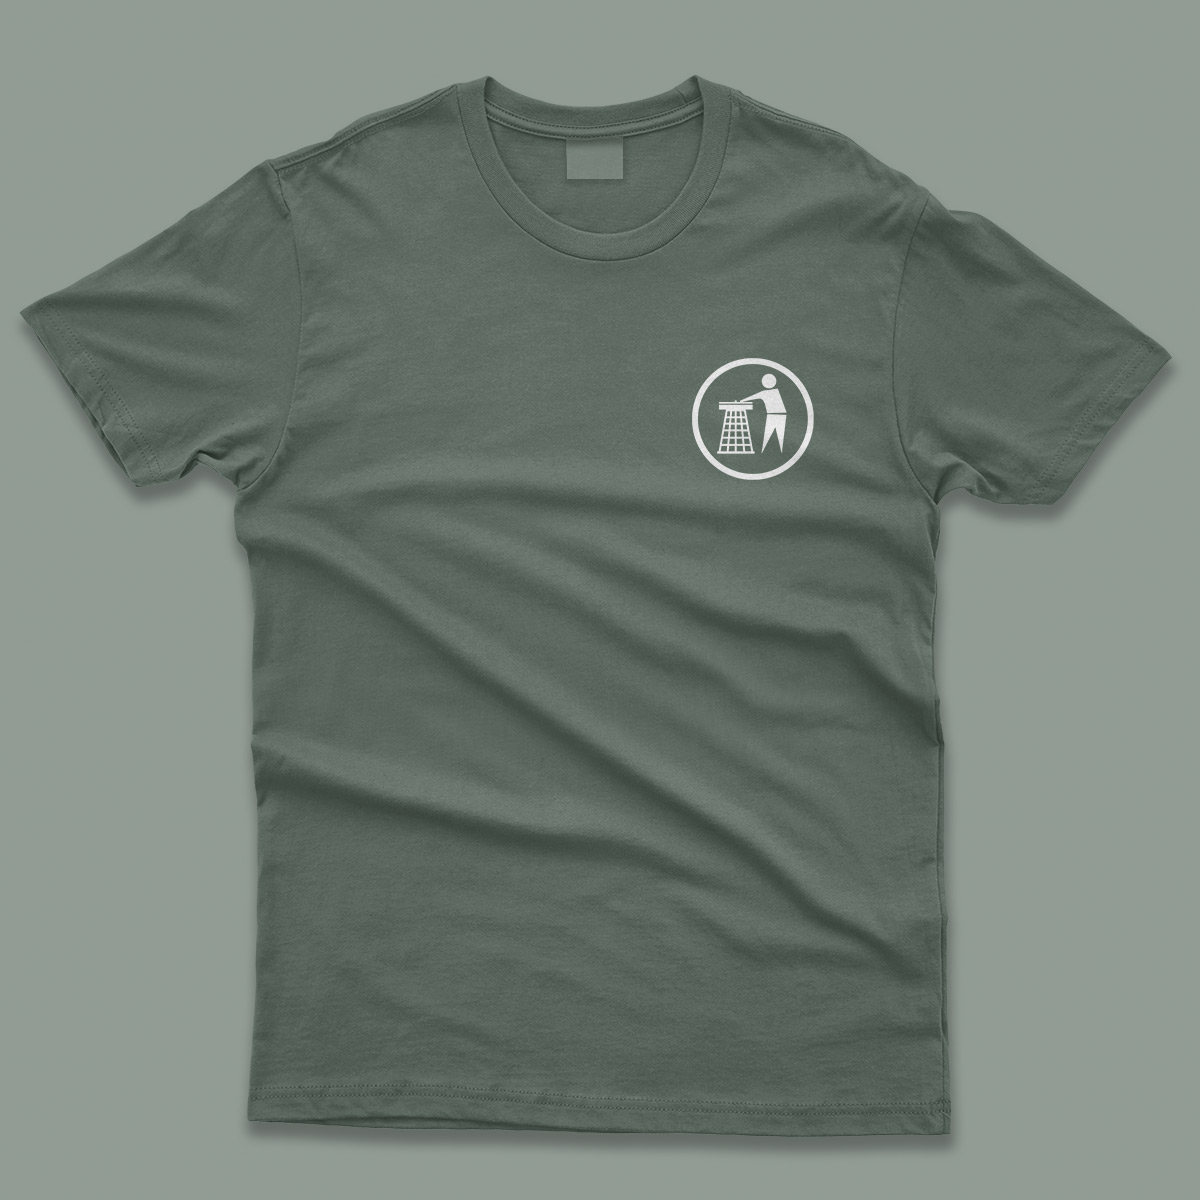 Tidy Classic Mens T-Shirt Khaki